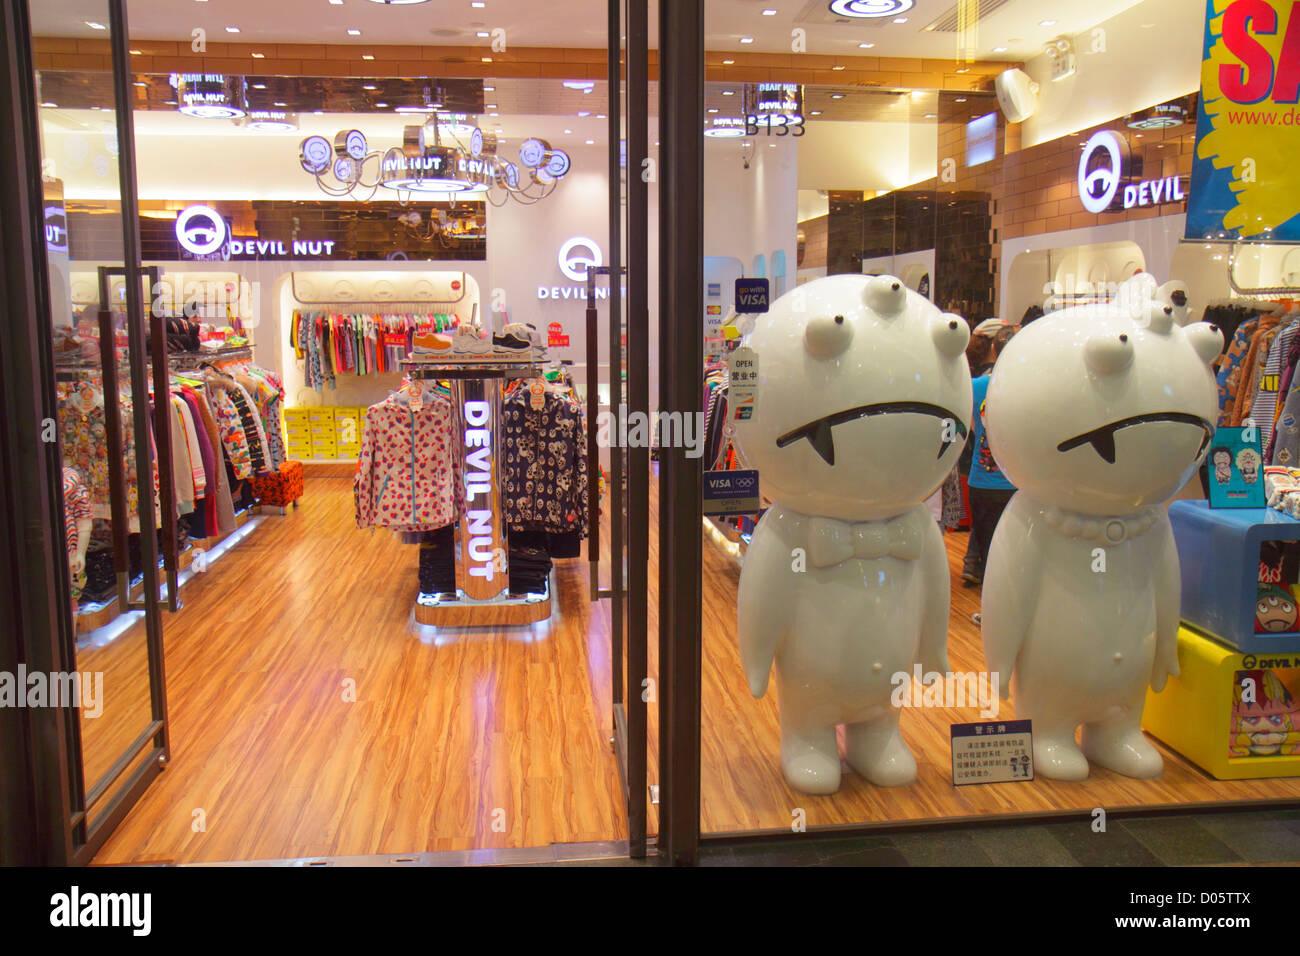 Shanghai China Luwan District Xintiandi Madang Road Xintiandi Style shopping mall Devil Nut clothing fashion front - Stock Image